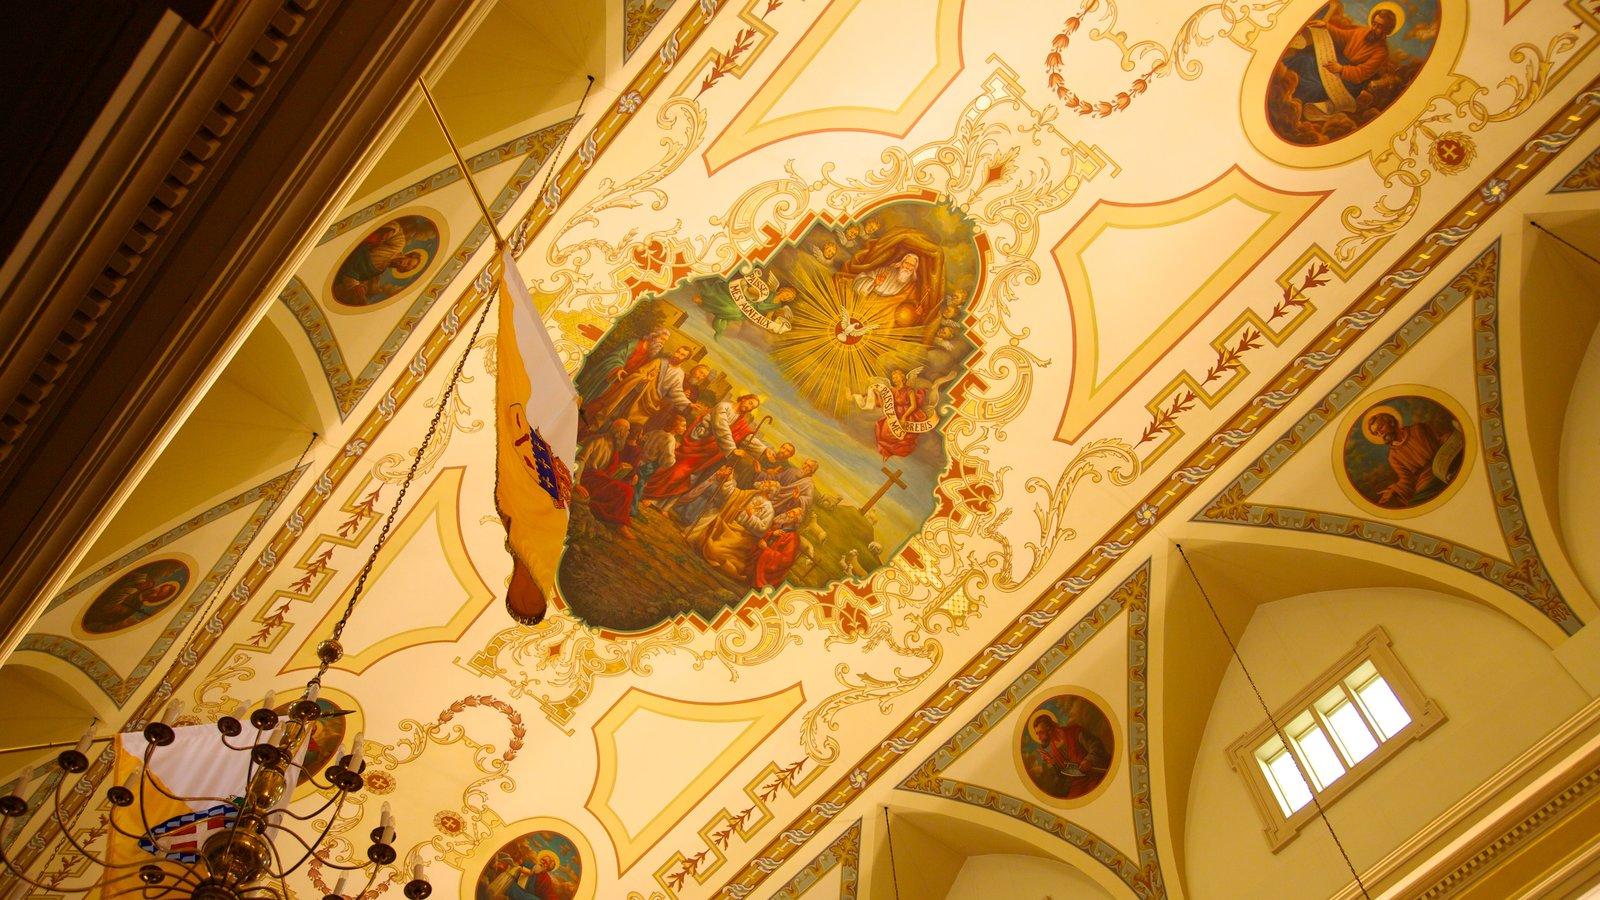 Saint Louis Cathedral caracterizando uma igreja ou catedral, vistas internas e elementos religiosos